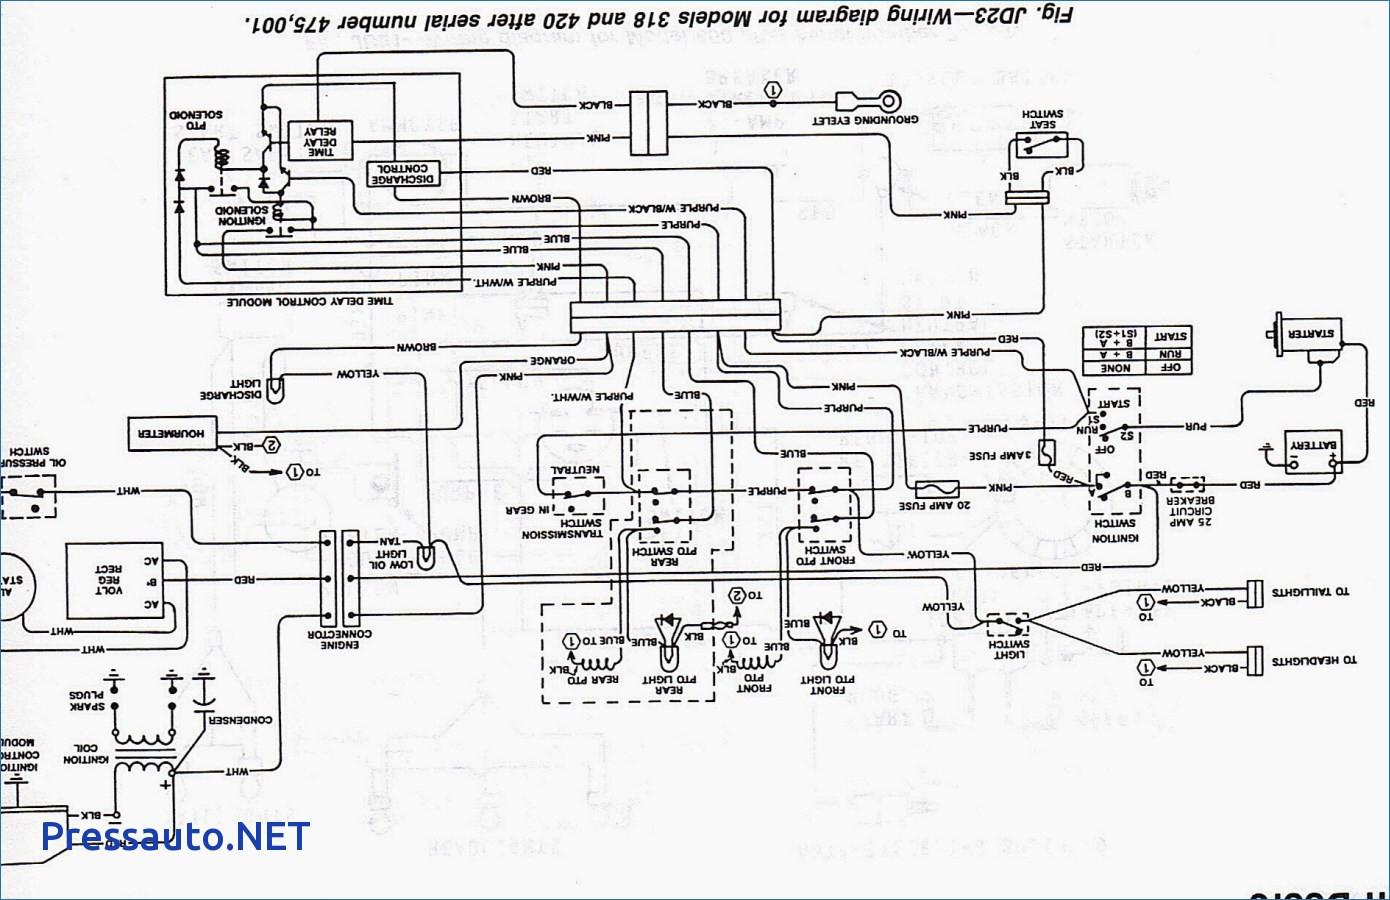 AR_9523] John Deere 318 Wiring Diagram Pdf Download DiagramBupi Inkl Elinu Sulf Abole Norab Genion Hendil Mohammedshrine Librar Wiring  101